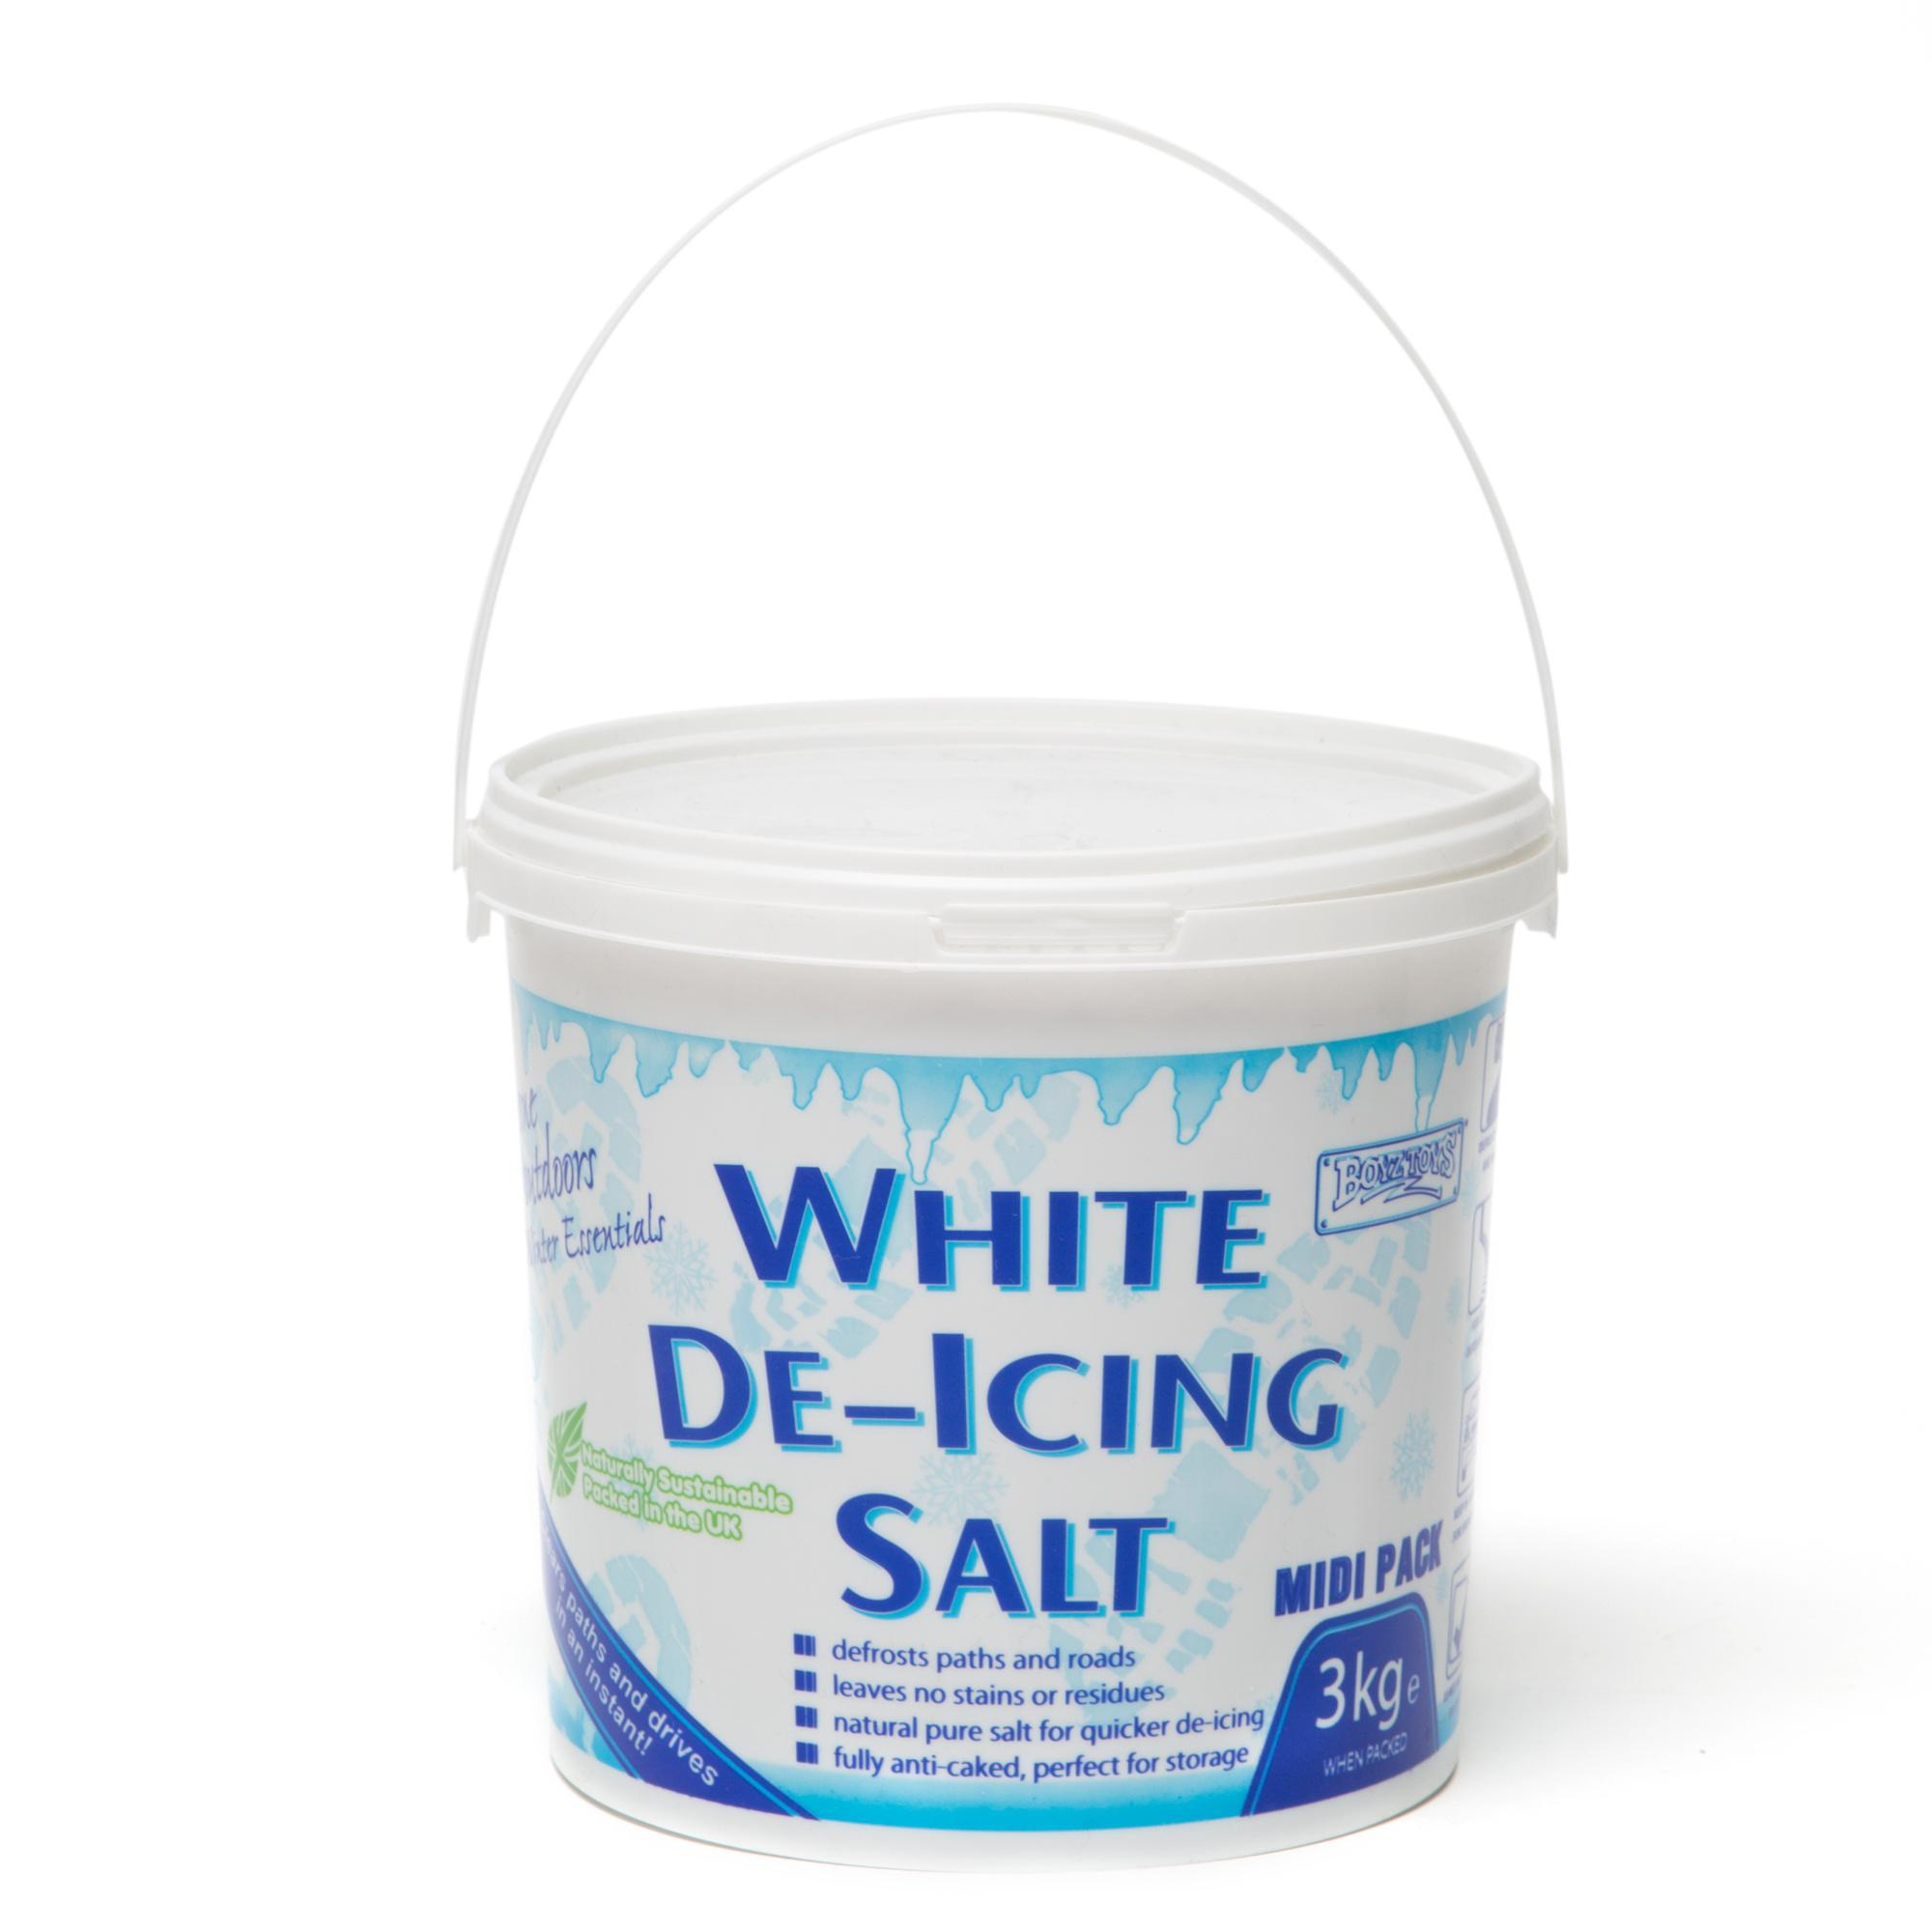 Boyz Toys White De-icing Salt Midi 3kg - White/3kg  White/3kg